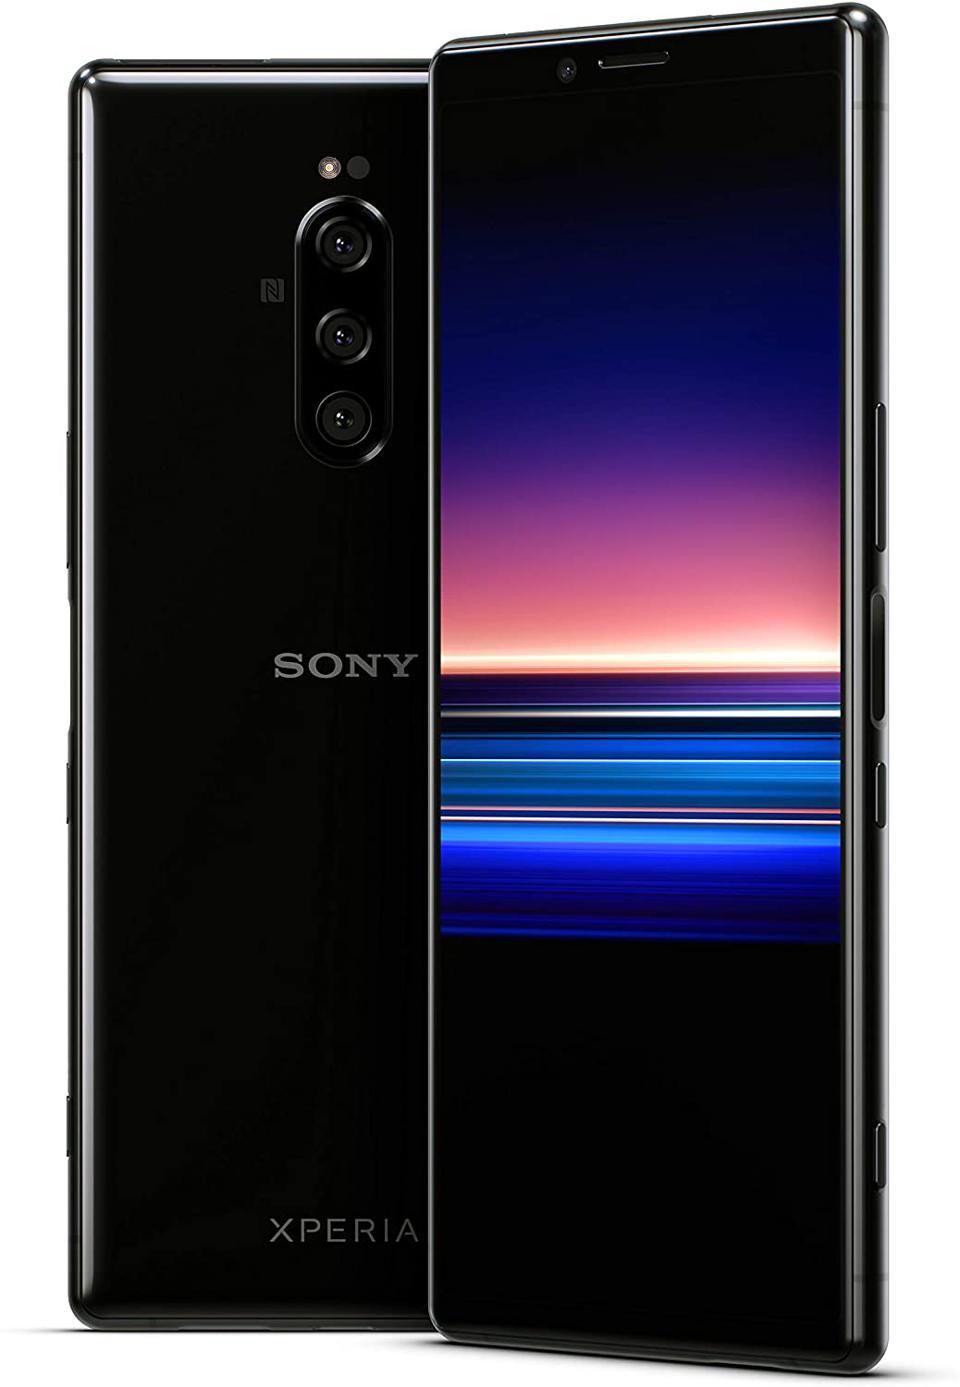 Sony Xperia 1 Unlocked Smartphone 6.5 ″ 4K HDR OLED Cinema Wide Display, 128GB - Black - (US Warranty)